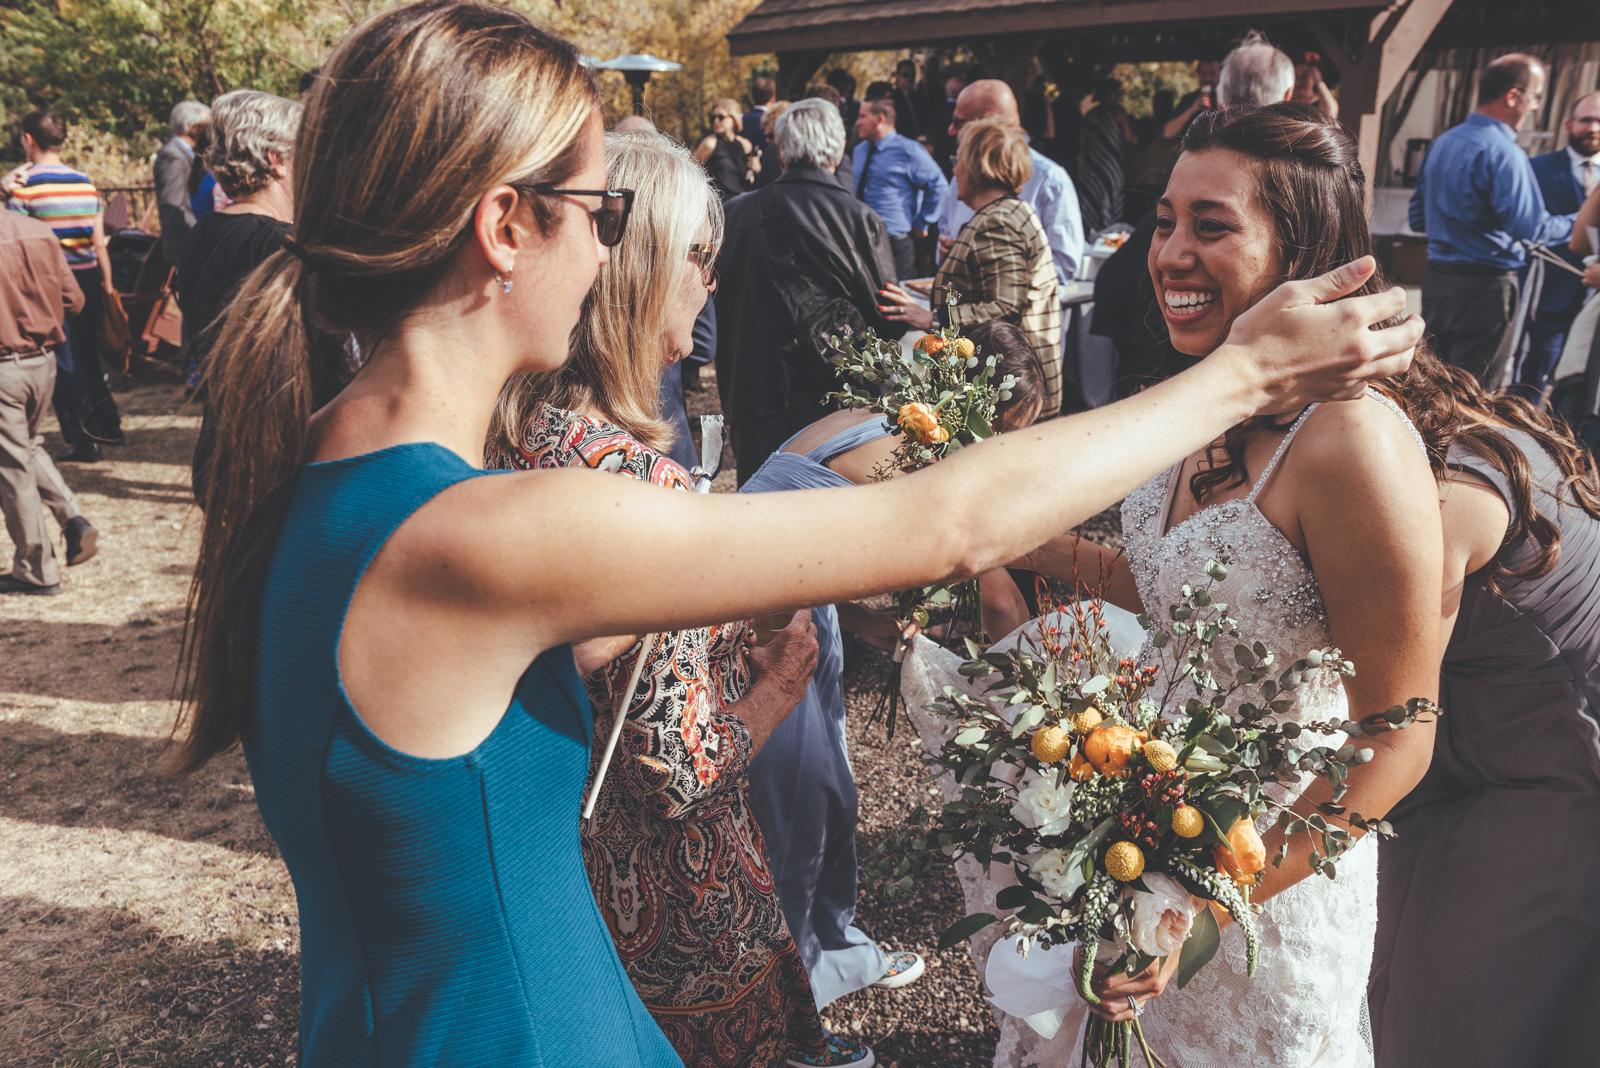 ChadFahnestockPhotography-estes-park-wedding-photography-030.jpg